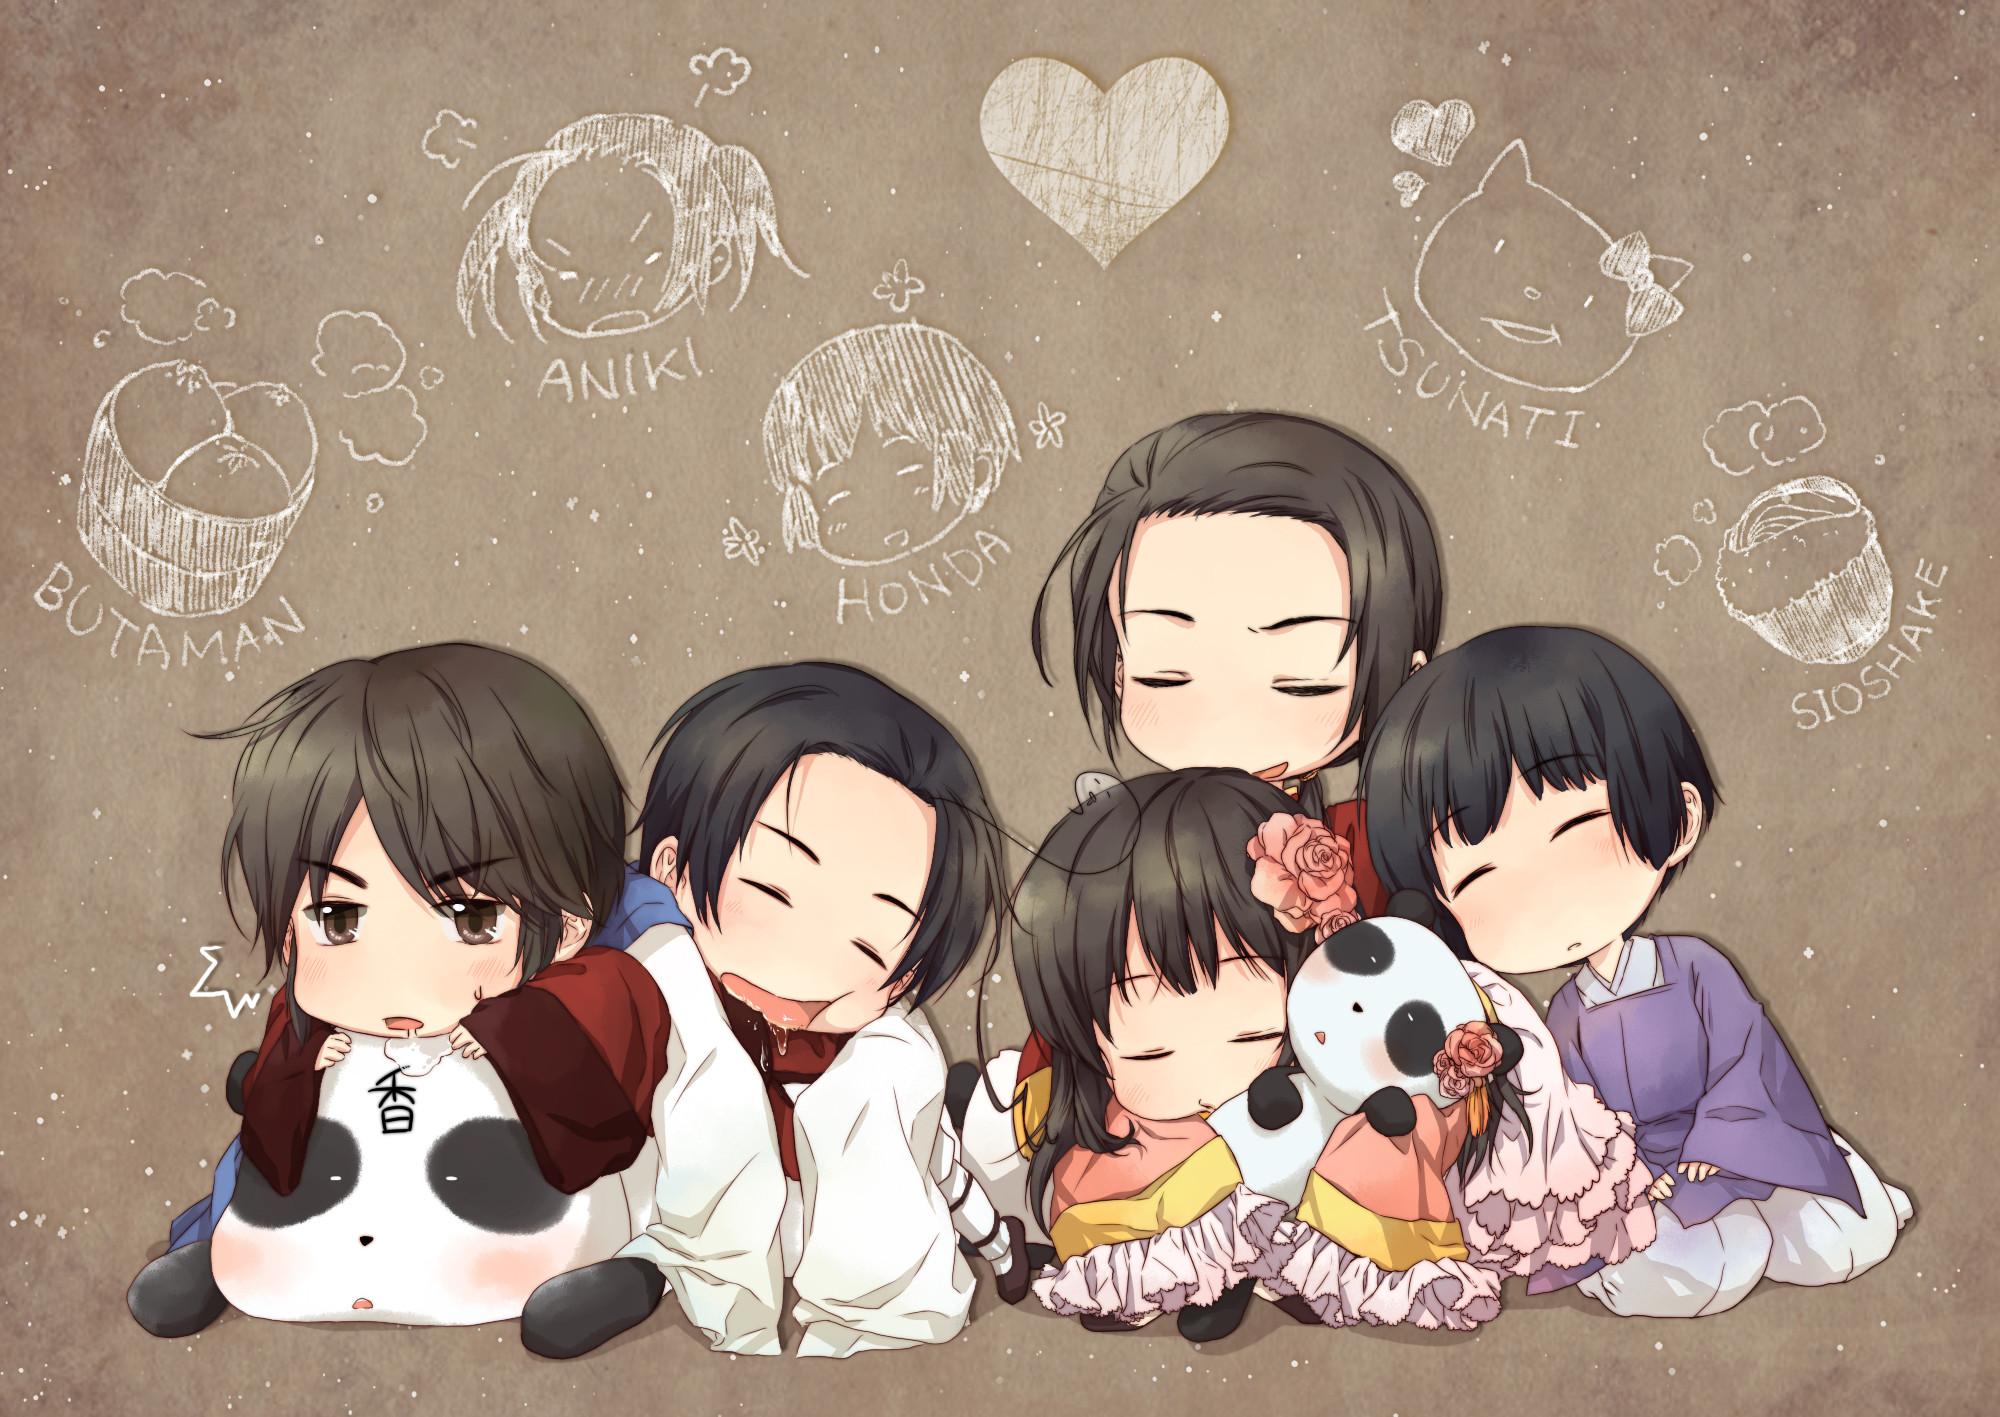 hetalia asian family images hetalia asian family HD wallpaper and background  photos